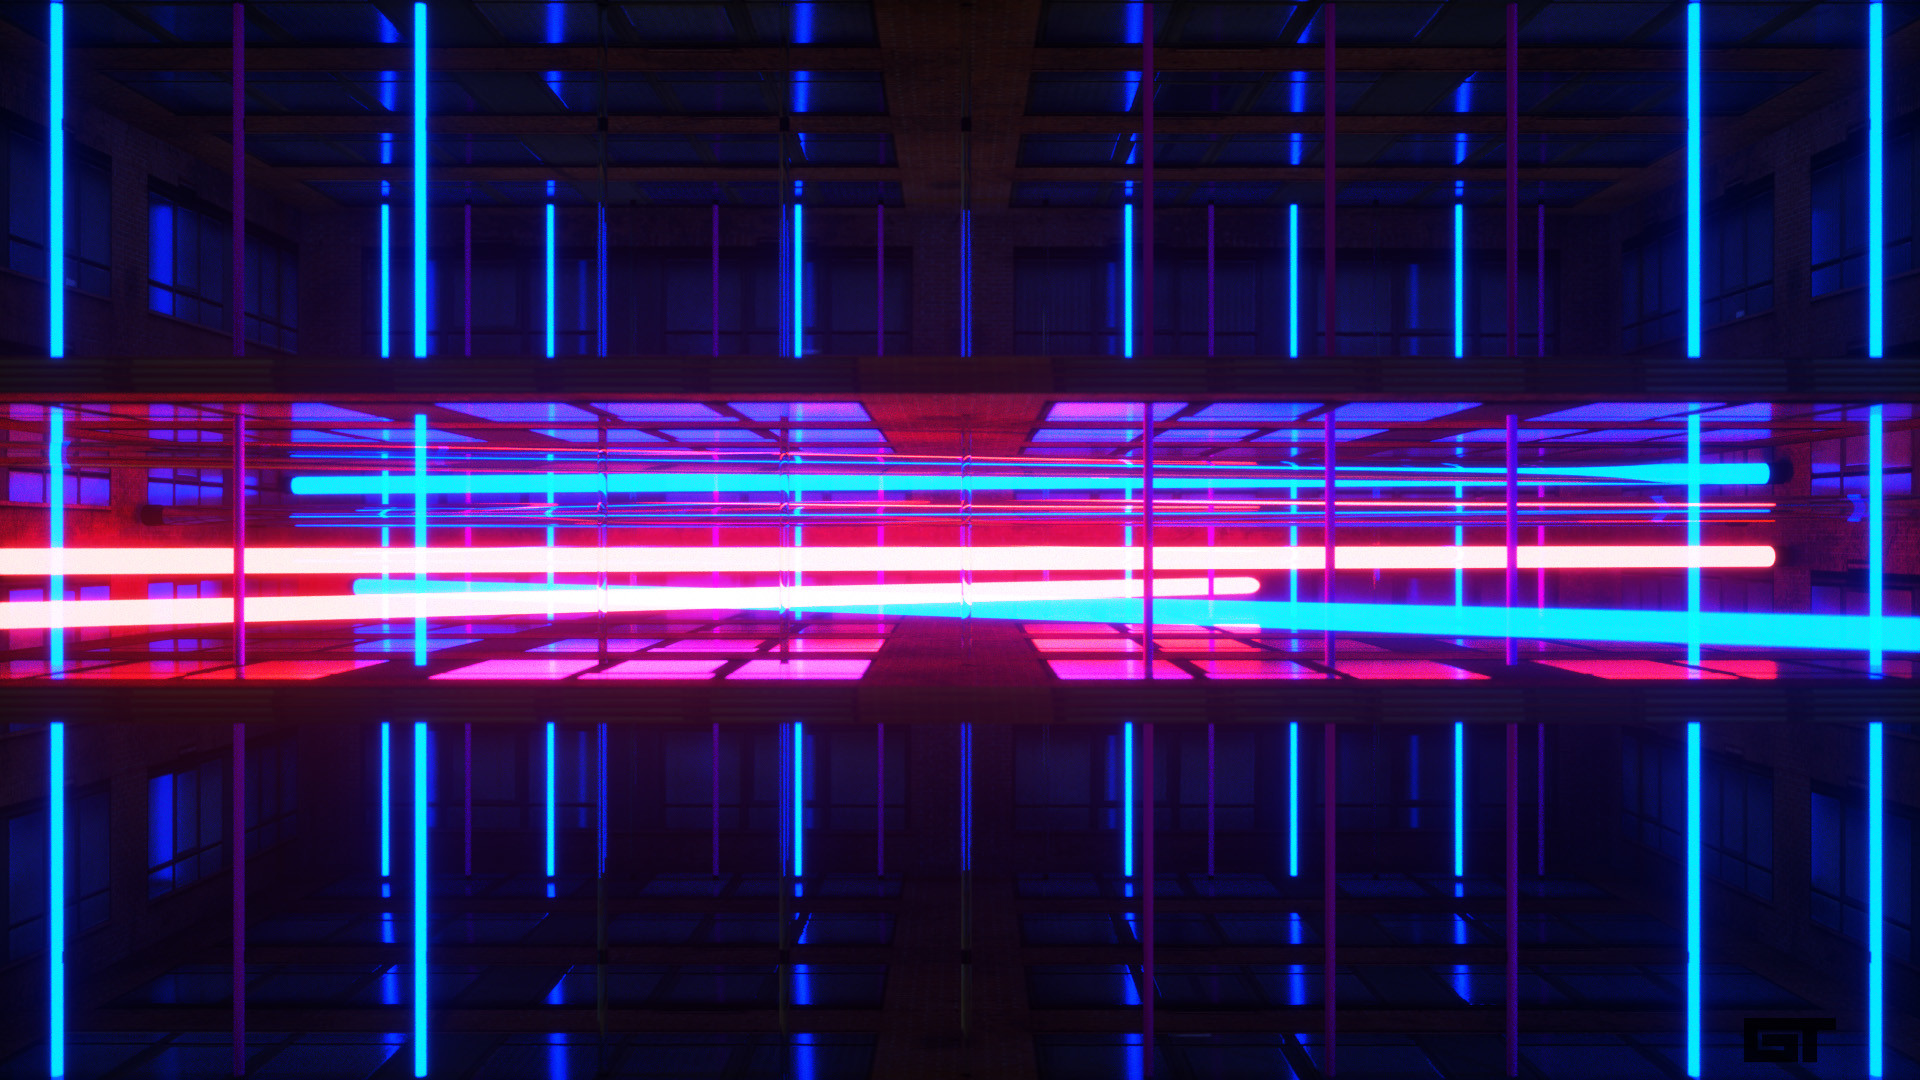 80s Grid Background 80s Grid Background 80s Laser #6308